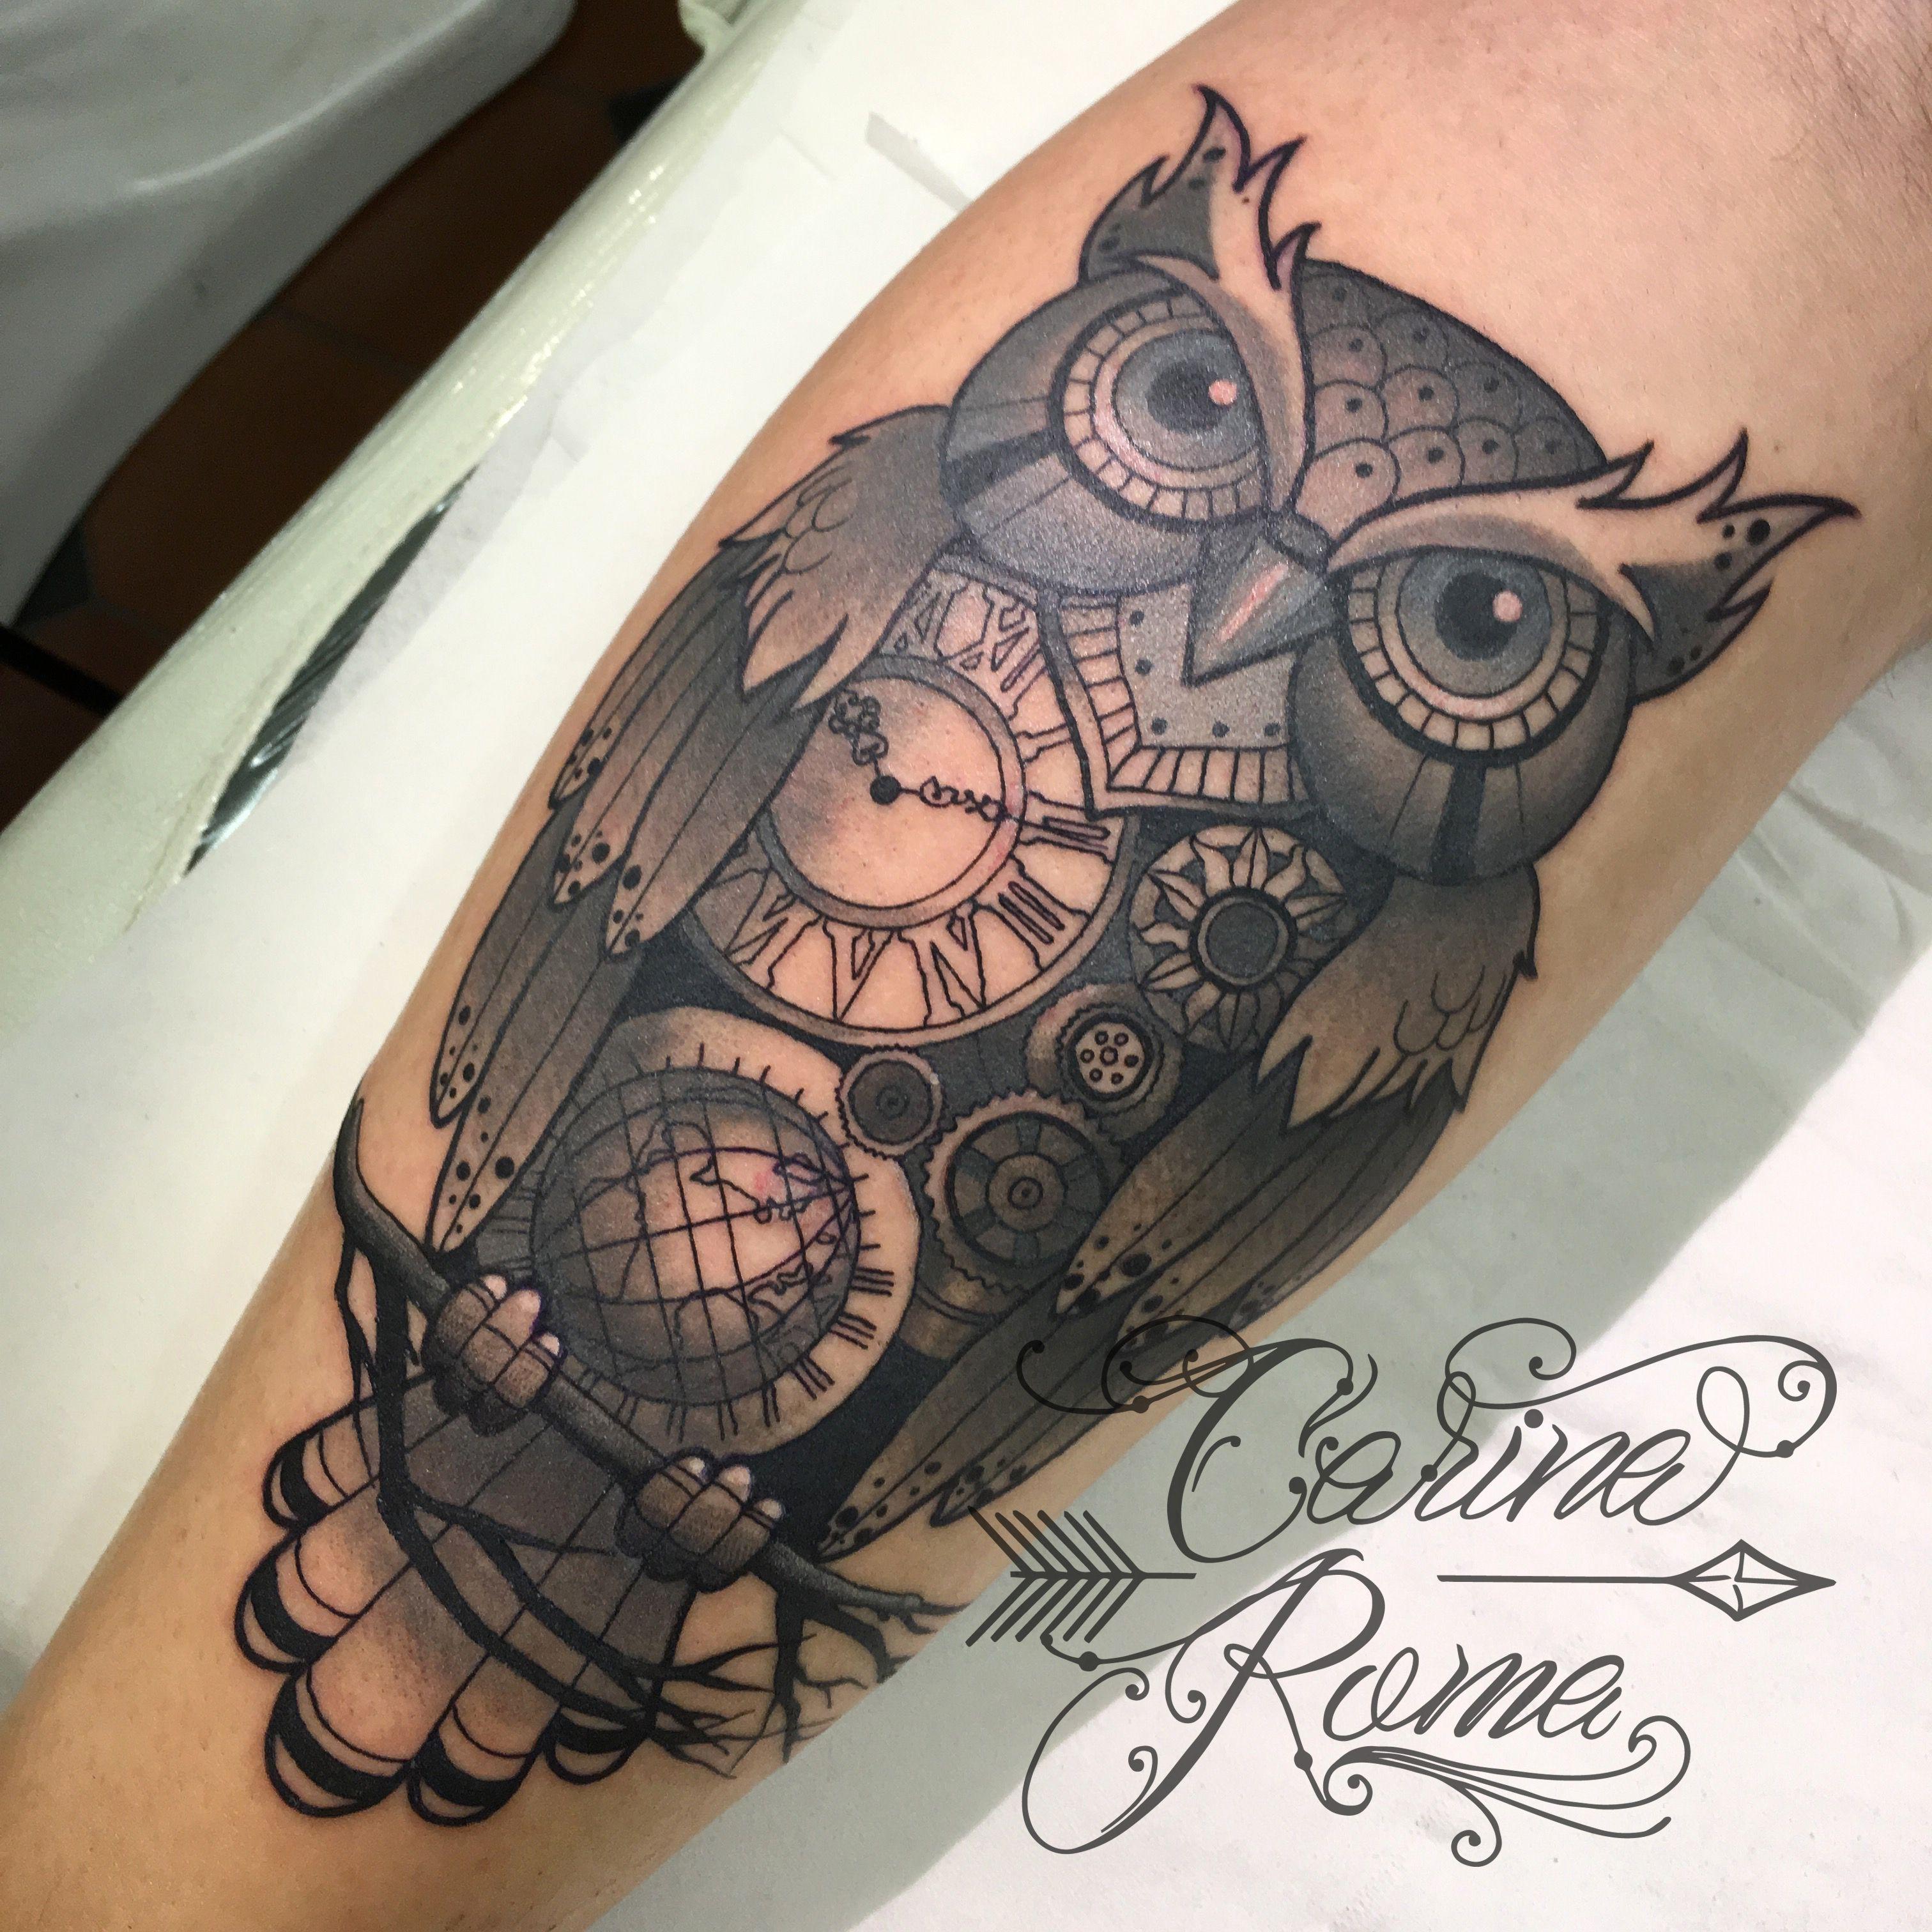 Clockwork Owl Neo Traditional Tattoo By Carina Roma Steampunk Tattoo Owl Tattoo Owl Tattoo Design